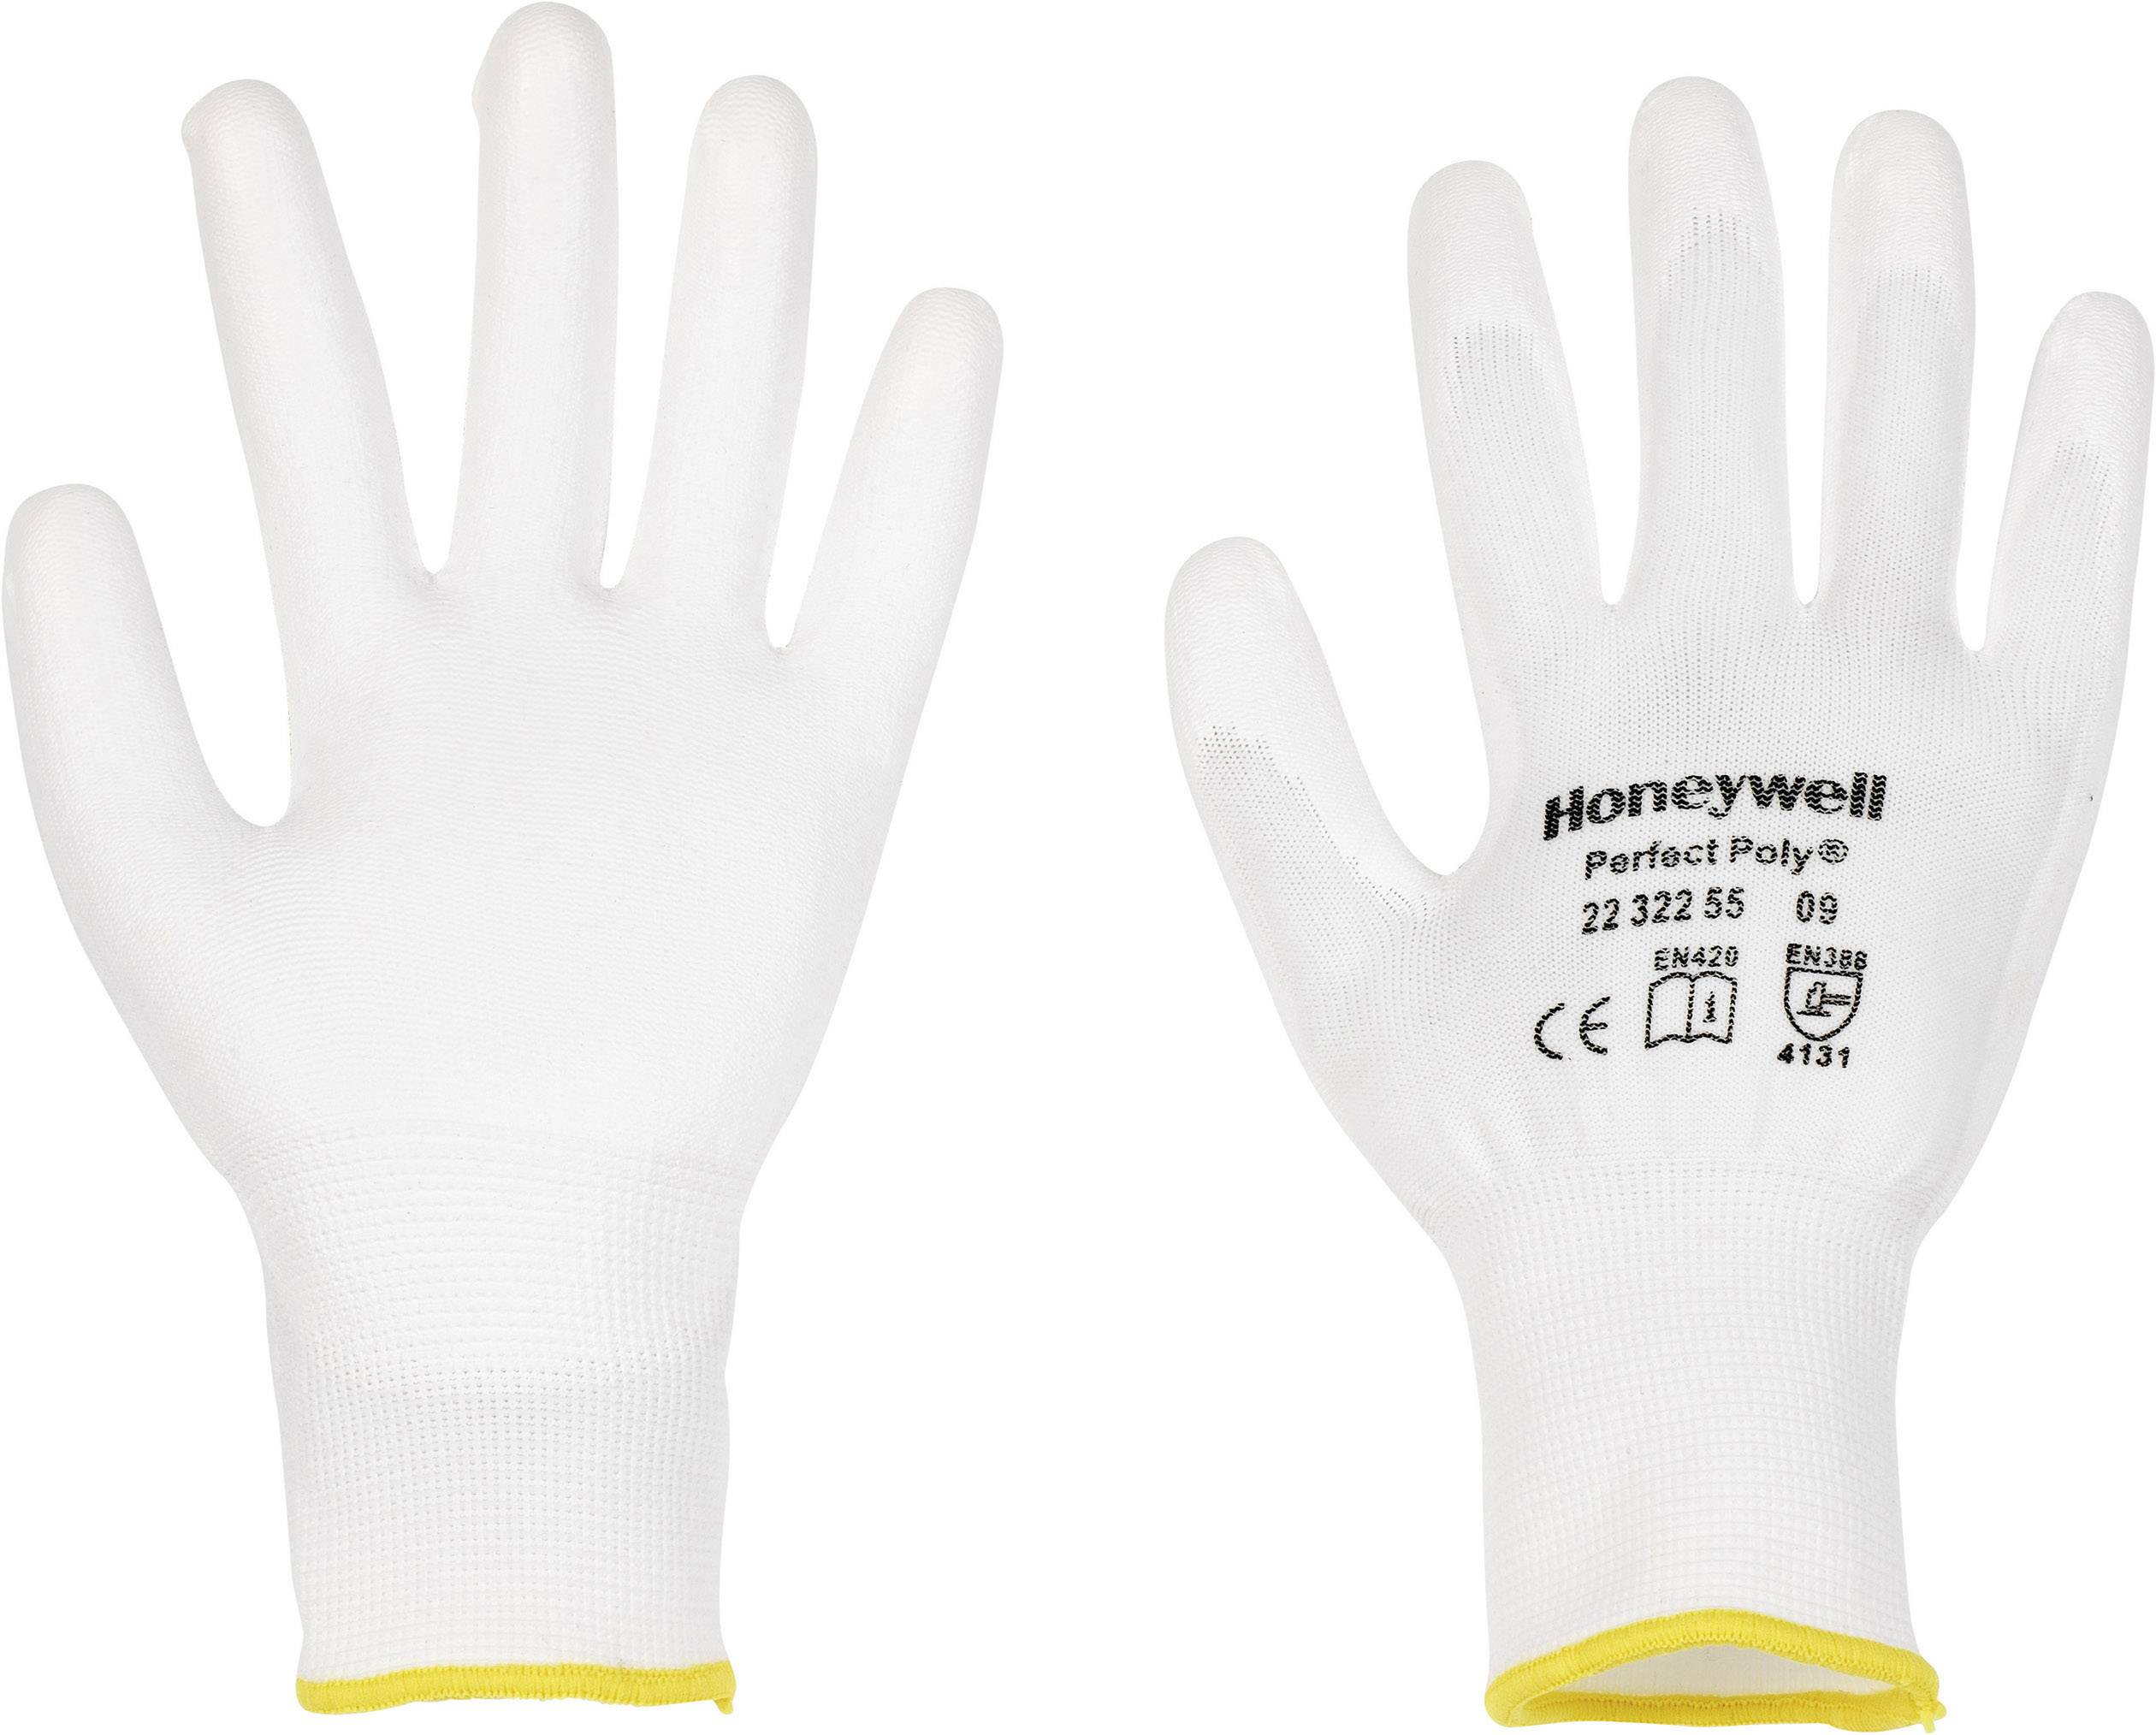 Pracovné rukavice Perfect Fit GANTS BLANCS PERFECTPOLY 2232255, velikost rukavic: 6, XS